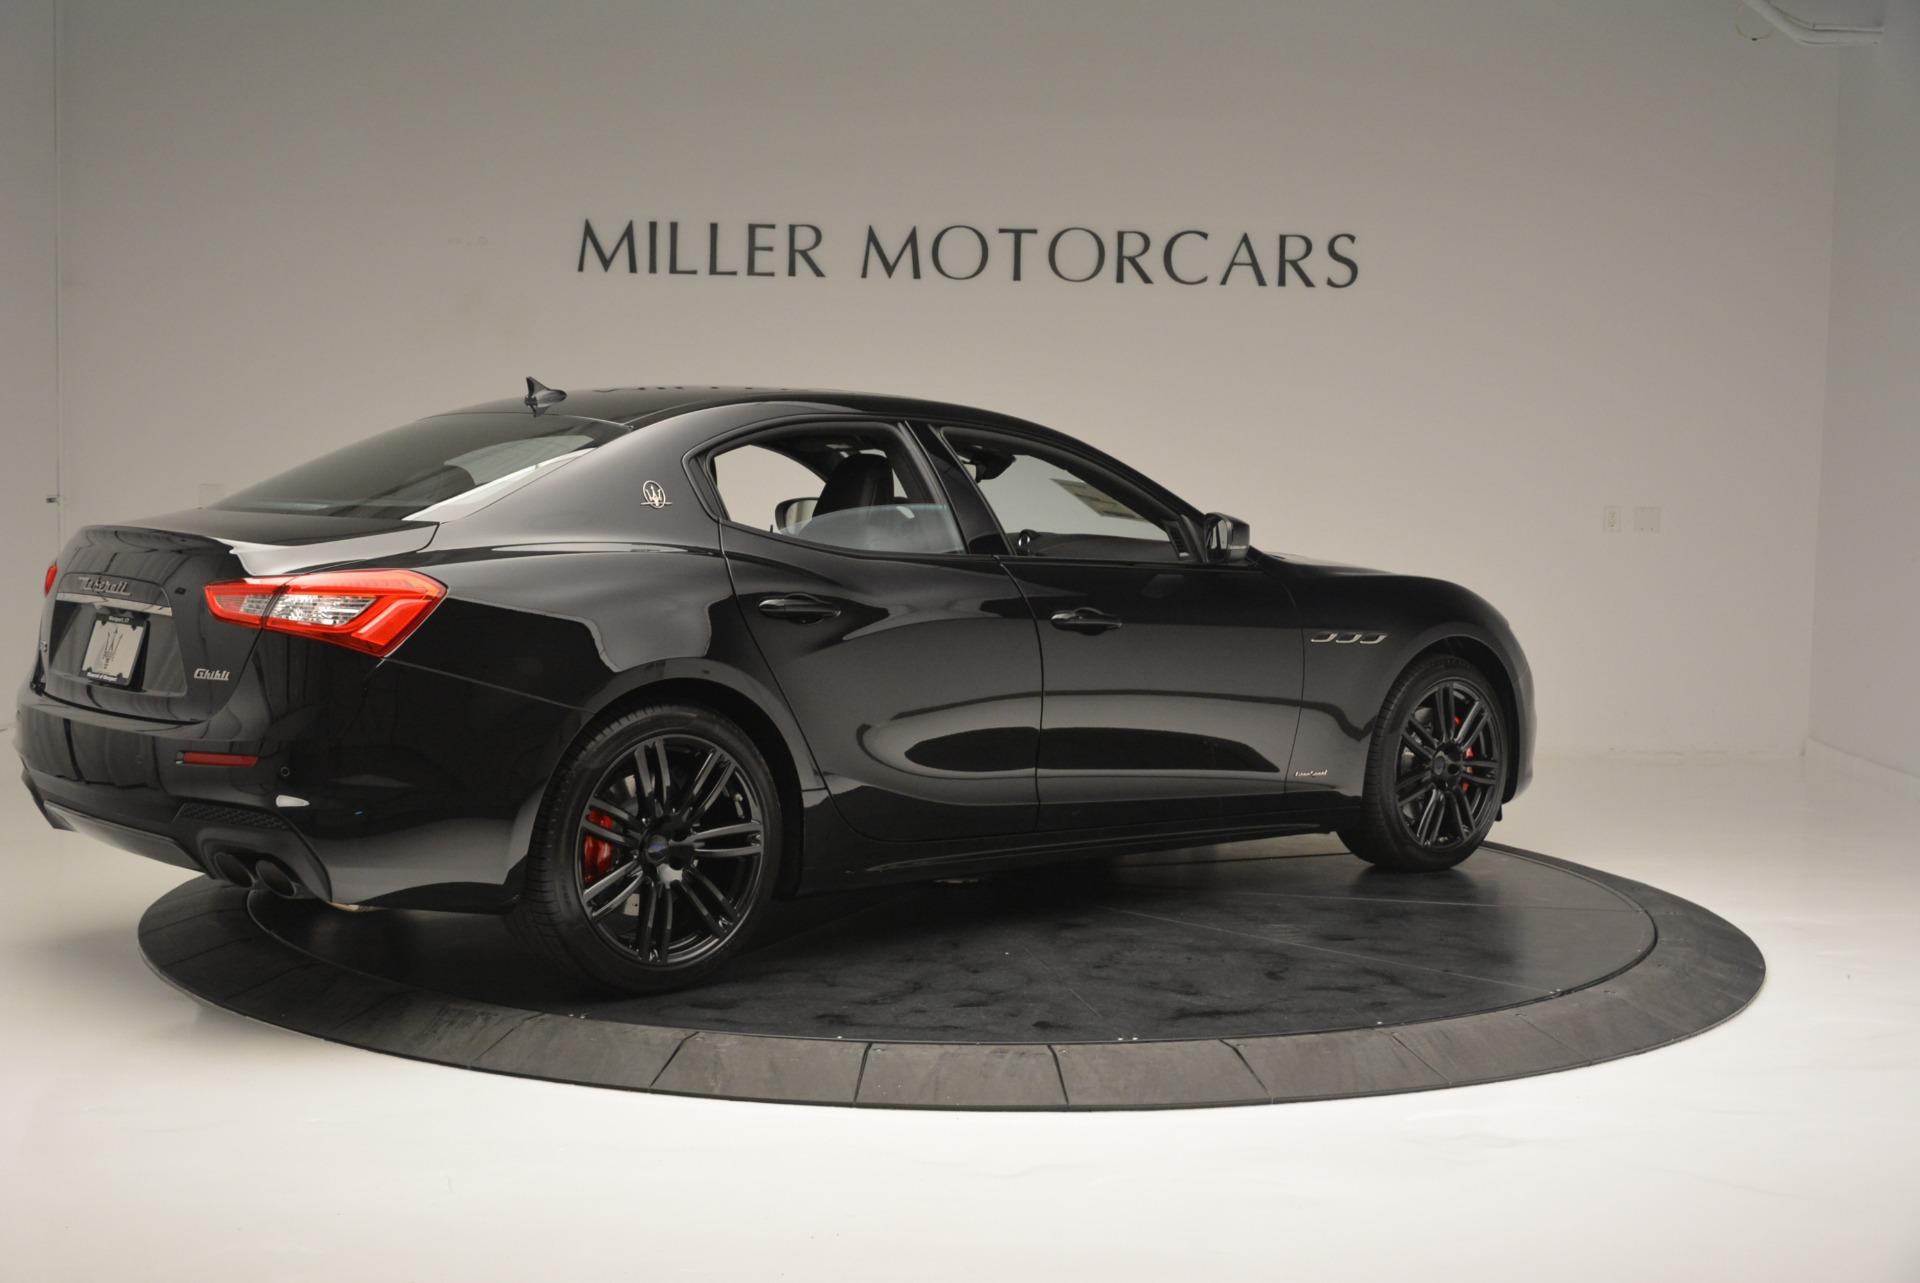 New 2018 Maserati Ghibli SQ4 GranSport Nerissimo For Sale In Westport, CT 2368_p8